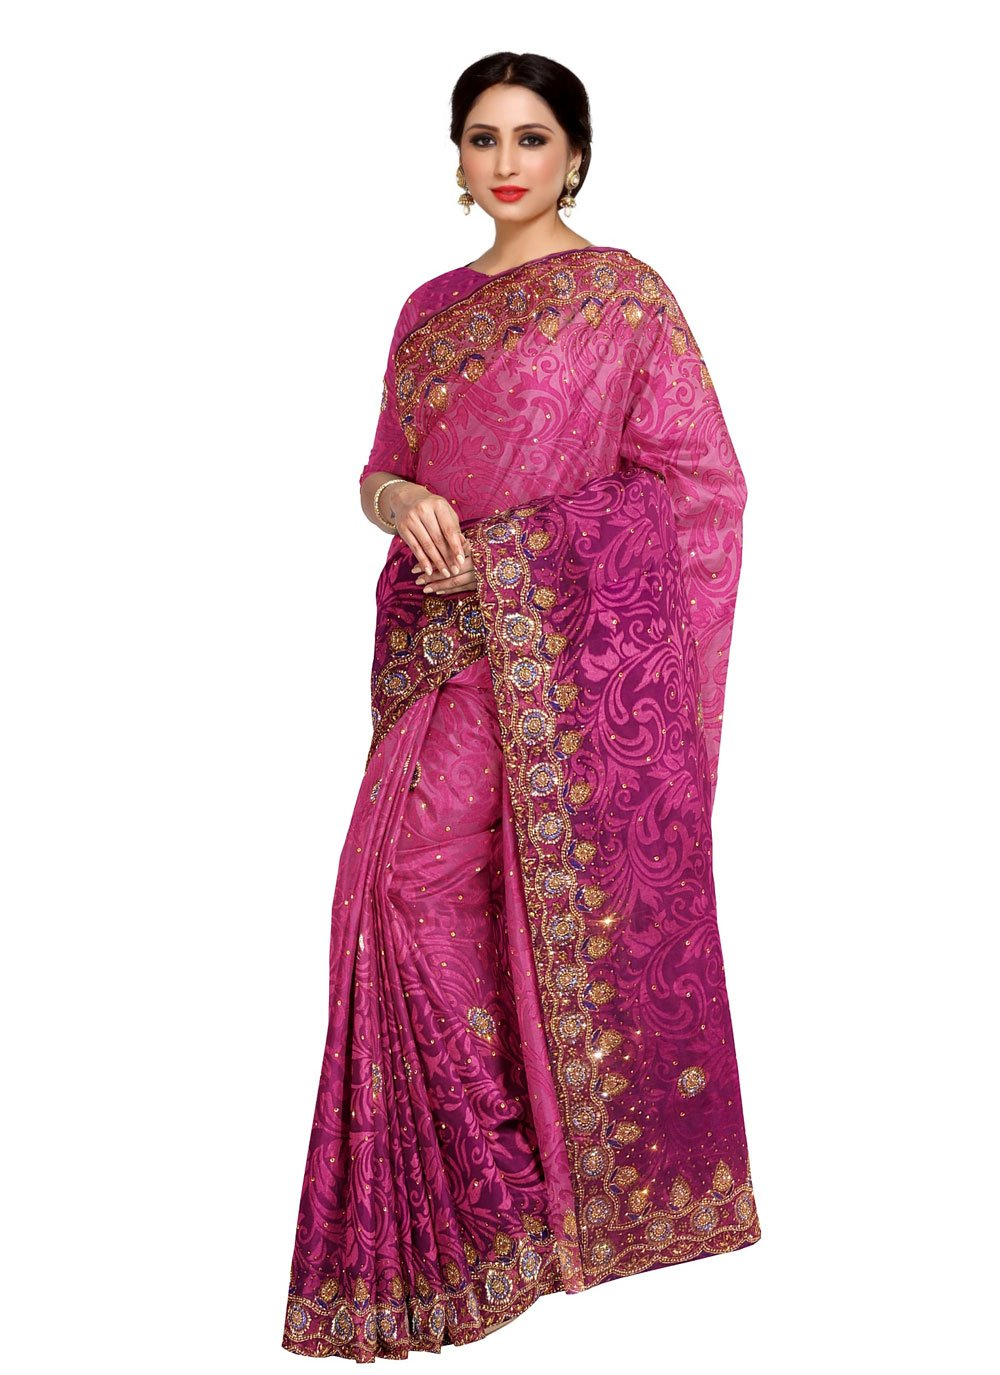 Designer Saree Fancy Fancy Fabric in Rani